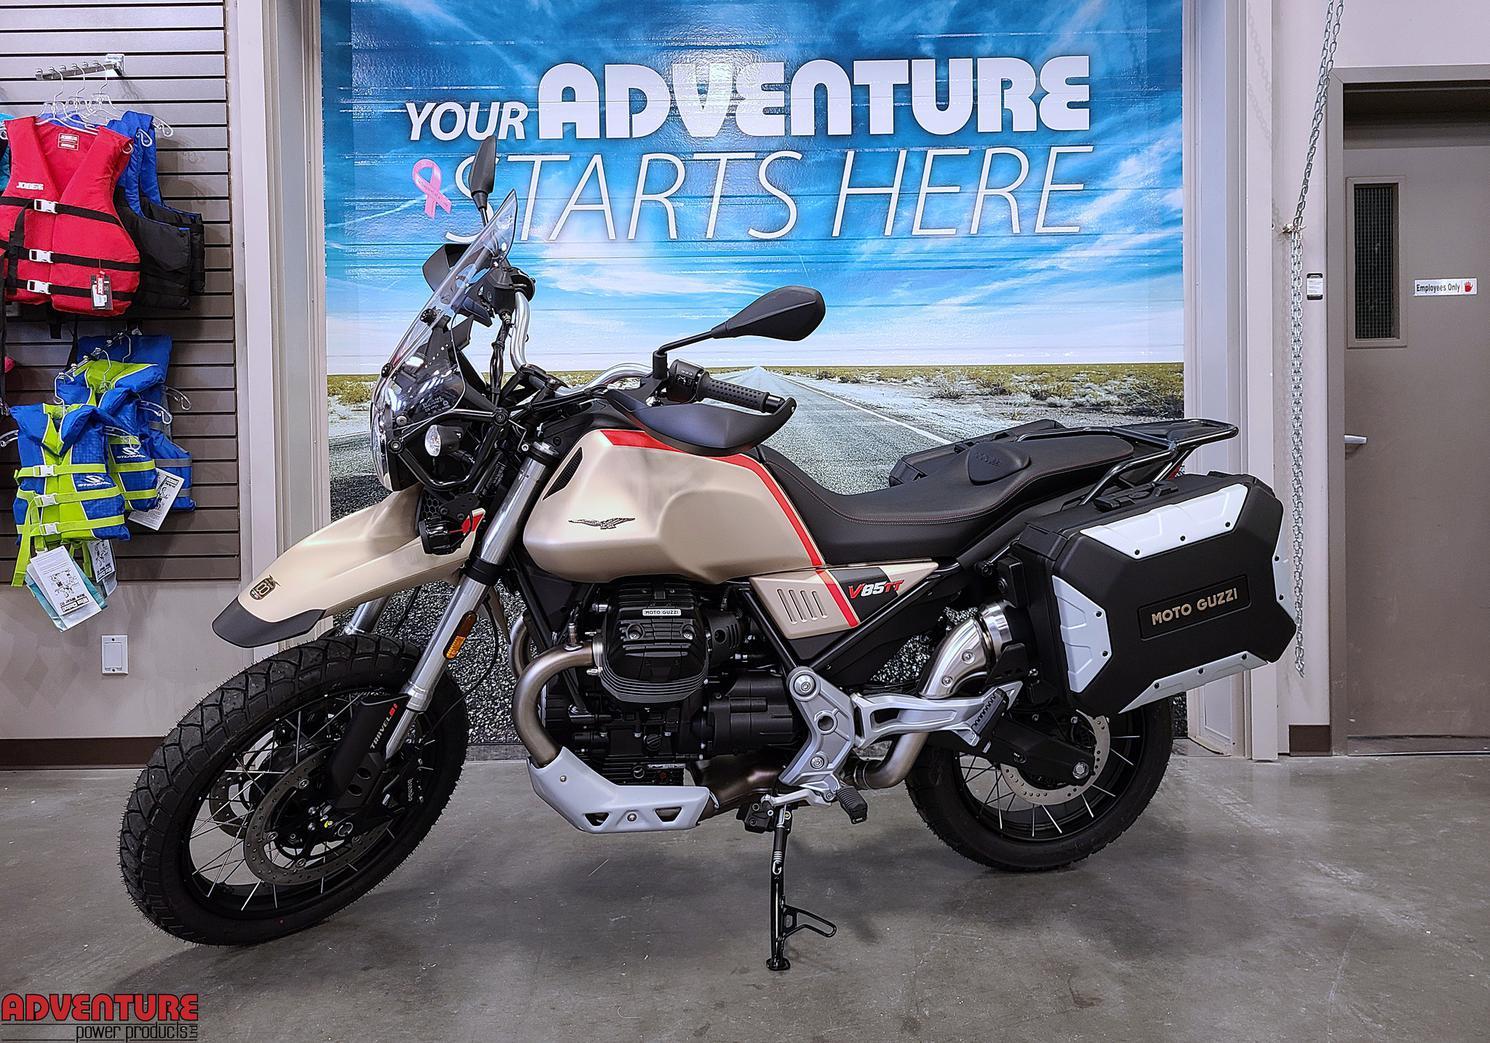 2021 Moto Guzzi V85 TT Travel Edition